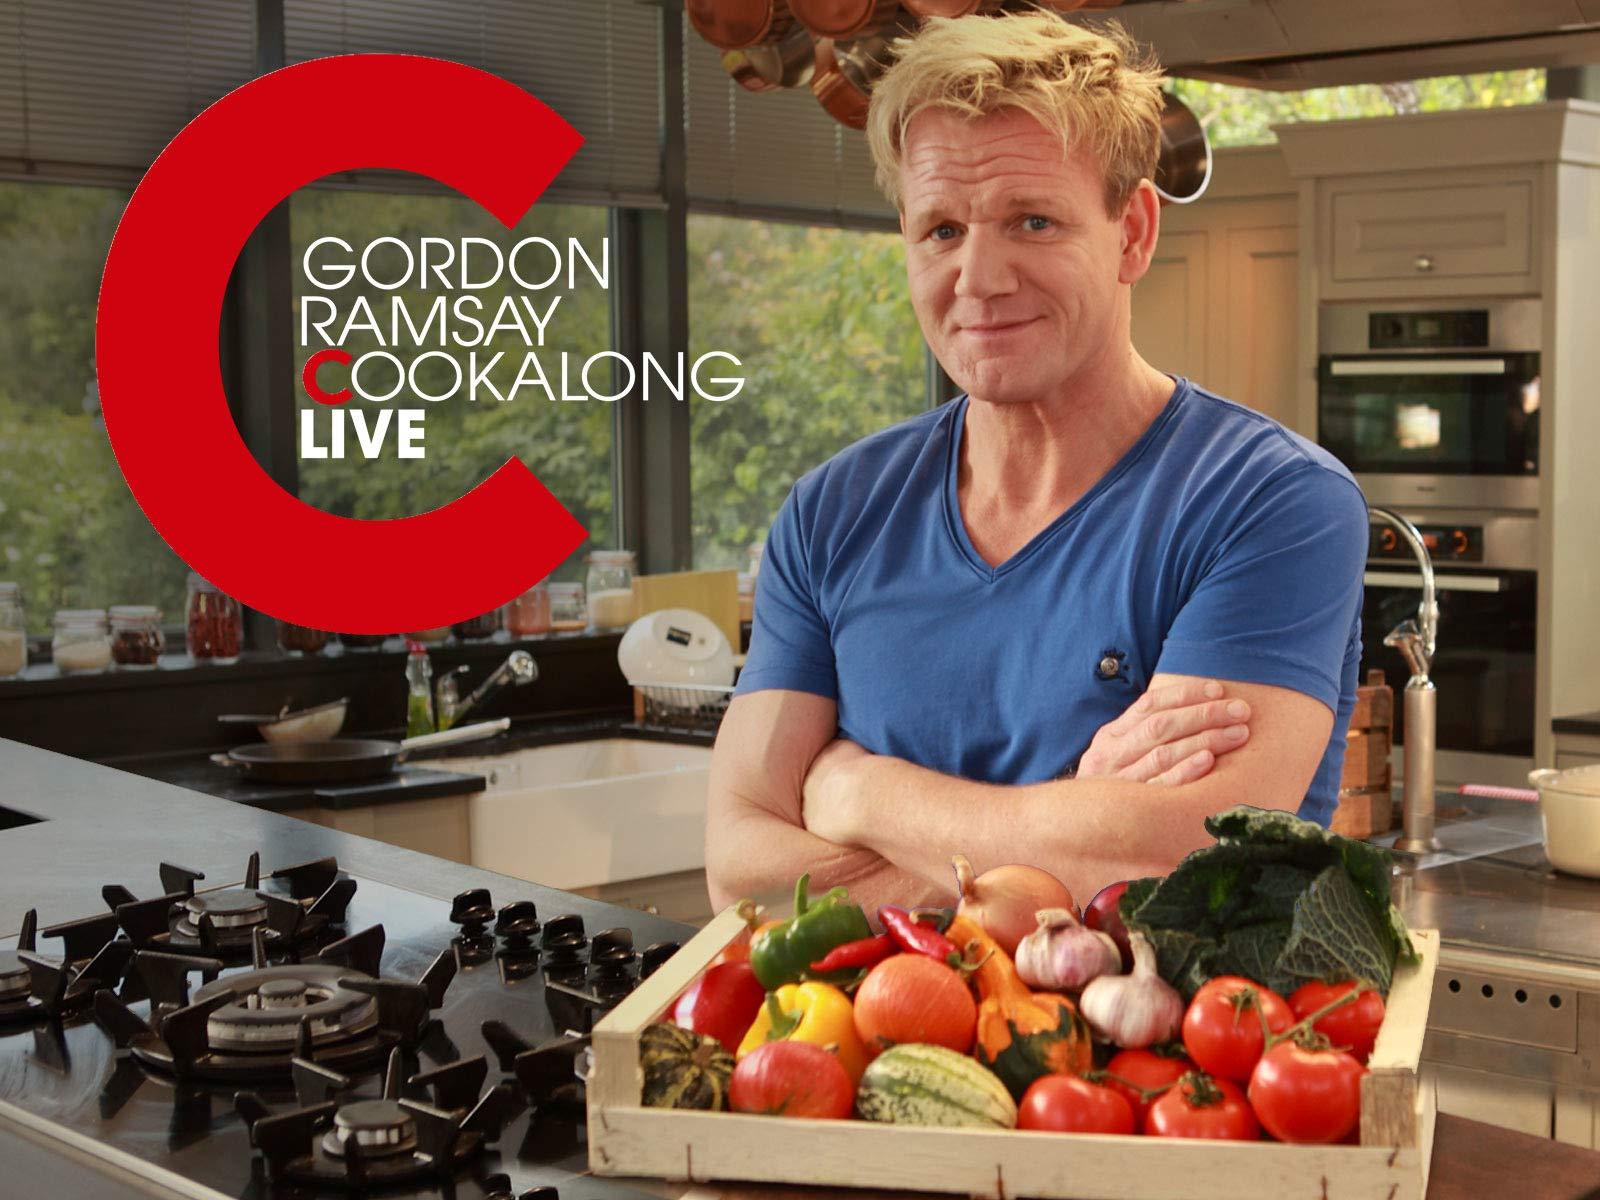 Gordon Ramsay: Cookalong Live